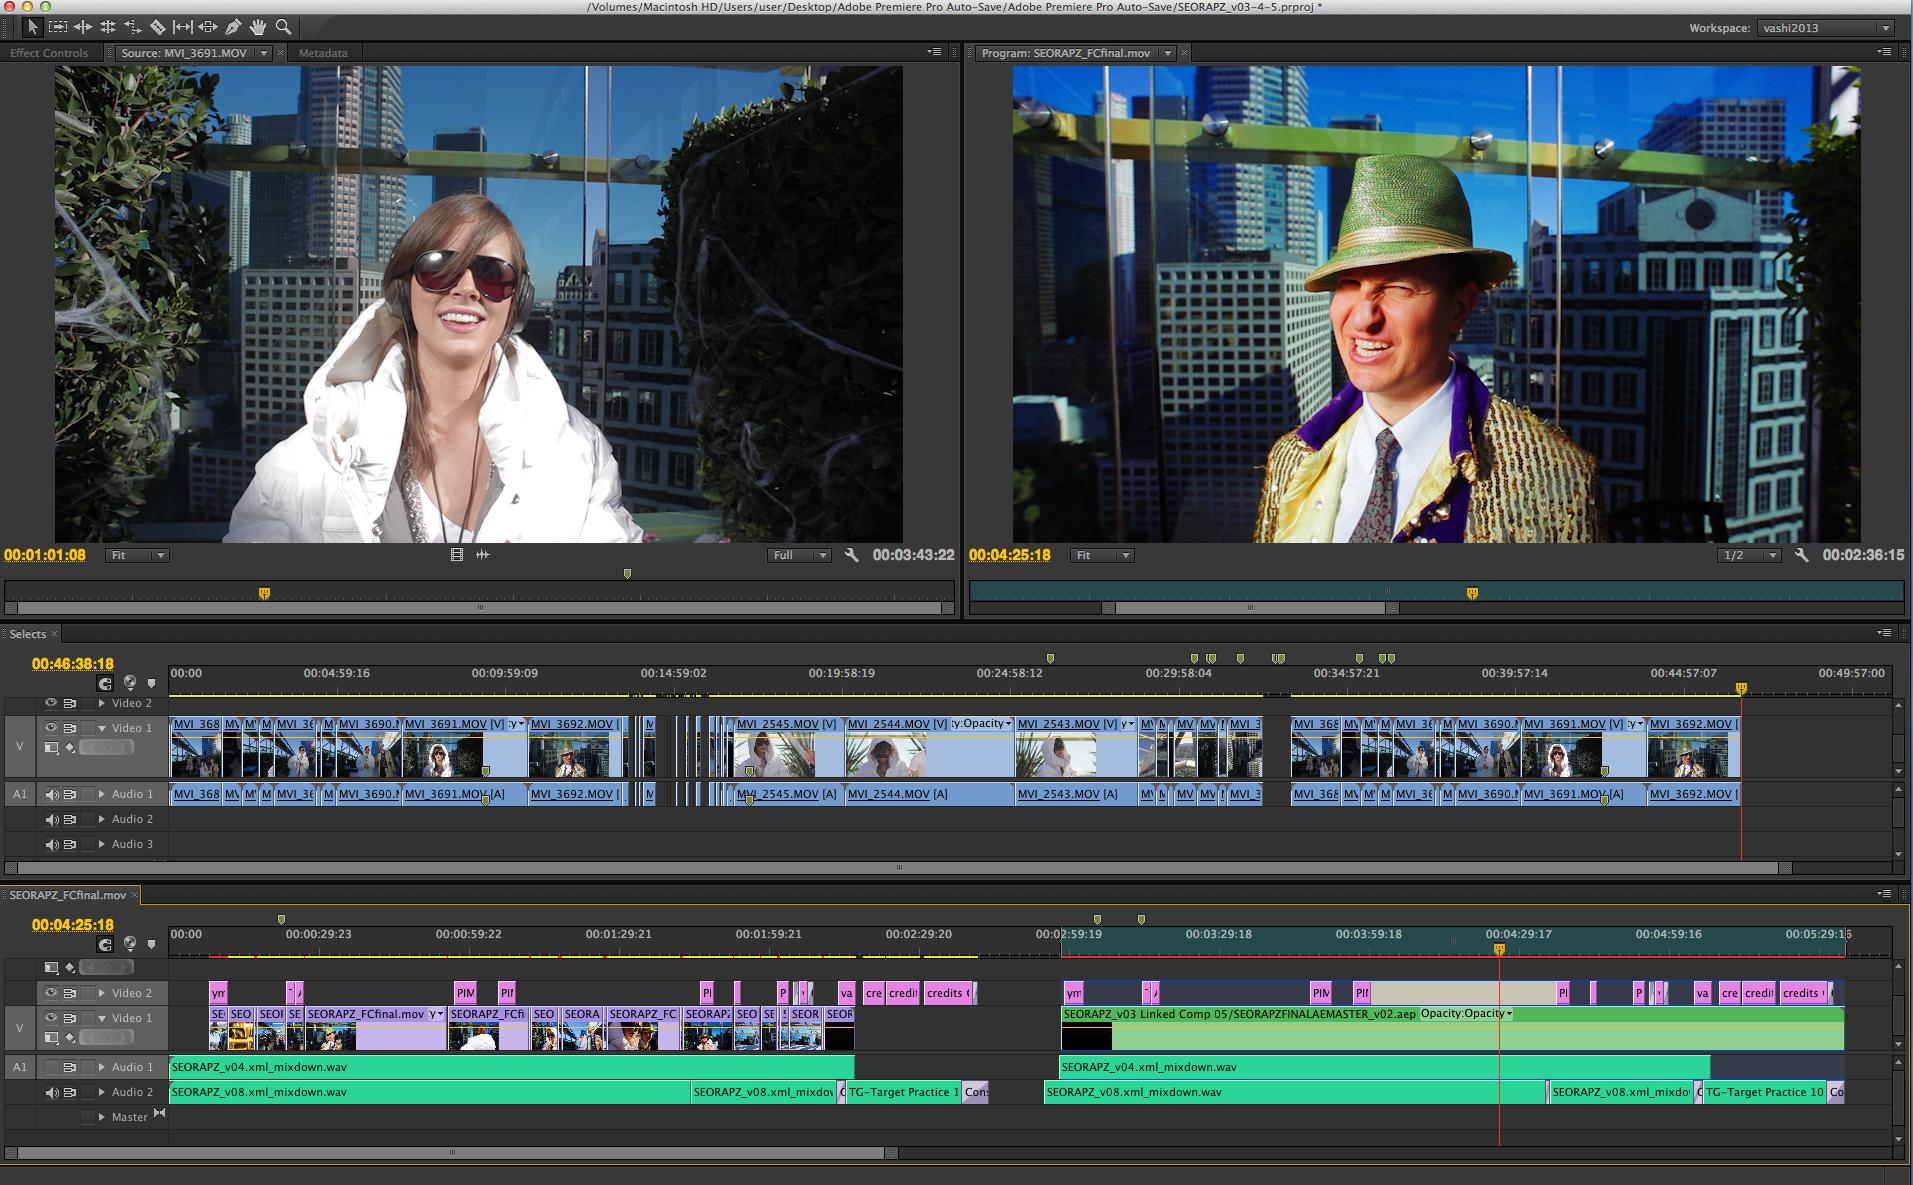 Adobe Premiere 6 5 Movie Editor Music Videos Movie Releases Video Editing